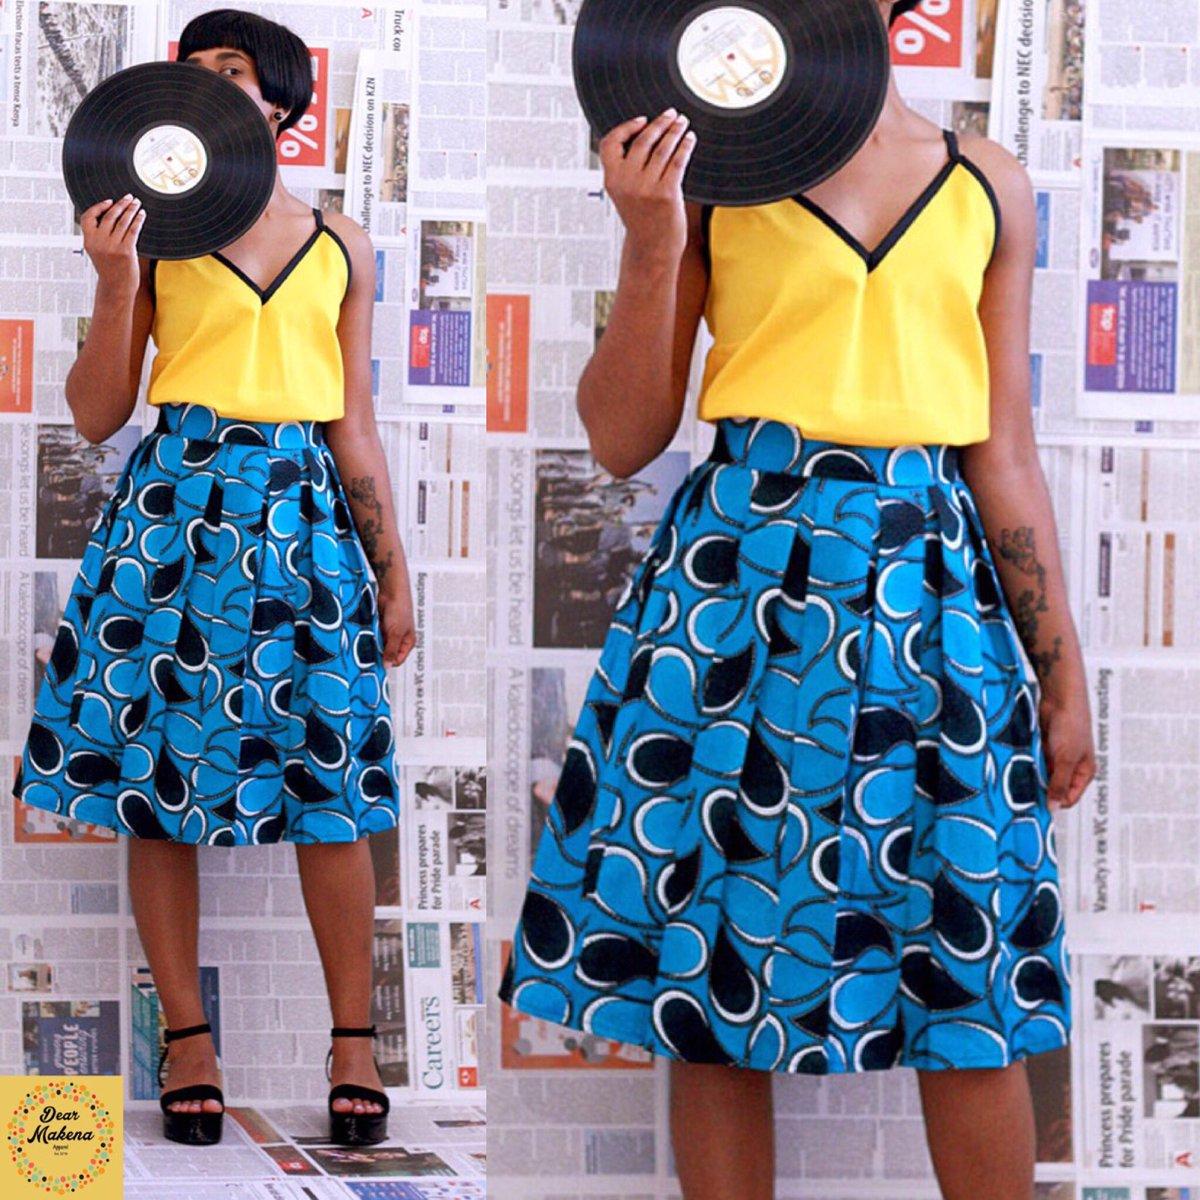 Meet our new SADIE box pleat skirt and TARI strap top! #africanfashion #womenswear #safashion<br>http://pic.twitter.com/B5liia7k7l